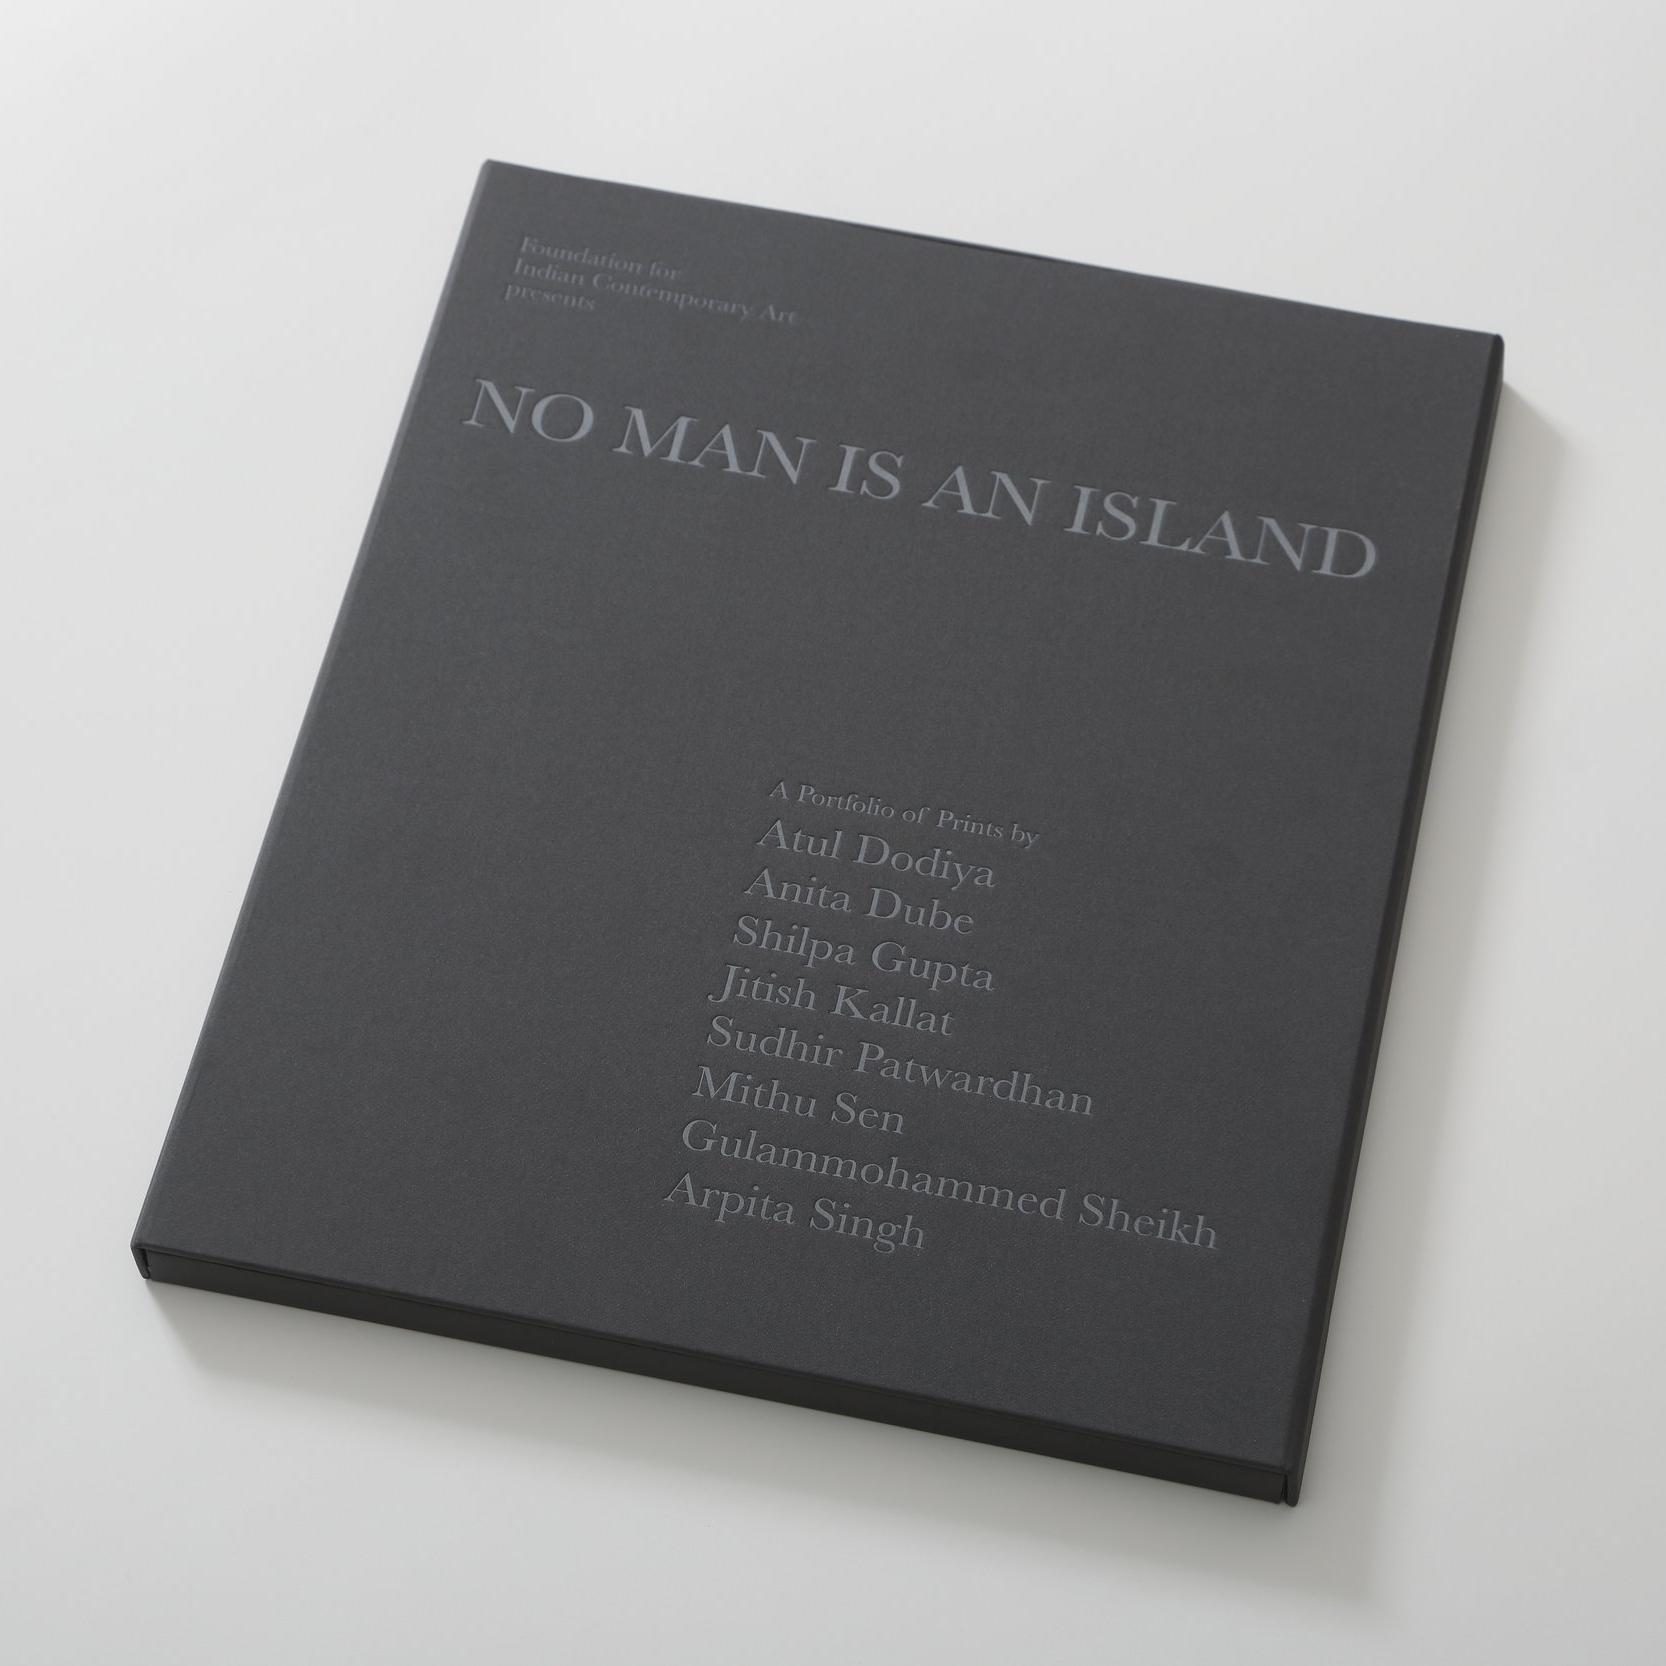 2018 | NO MAN IS AN ISLAND: A PORTFOLIO OF PRINTS